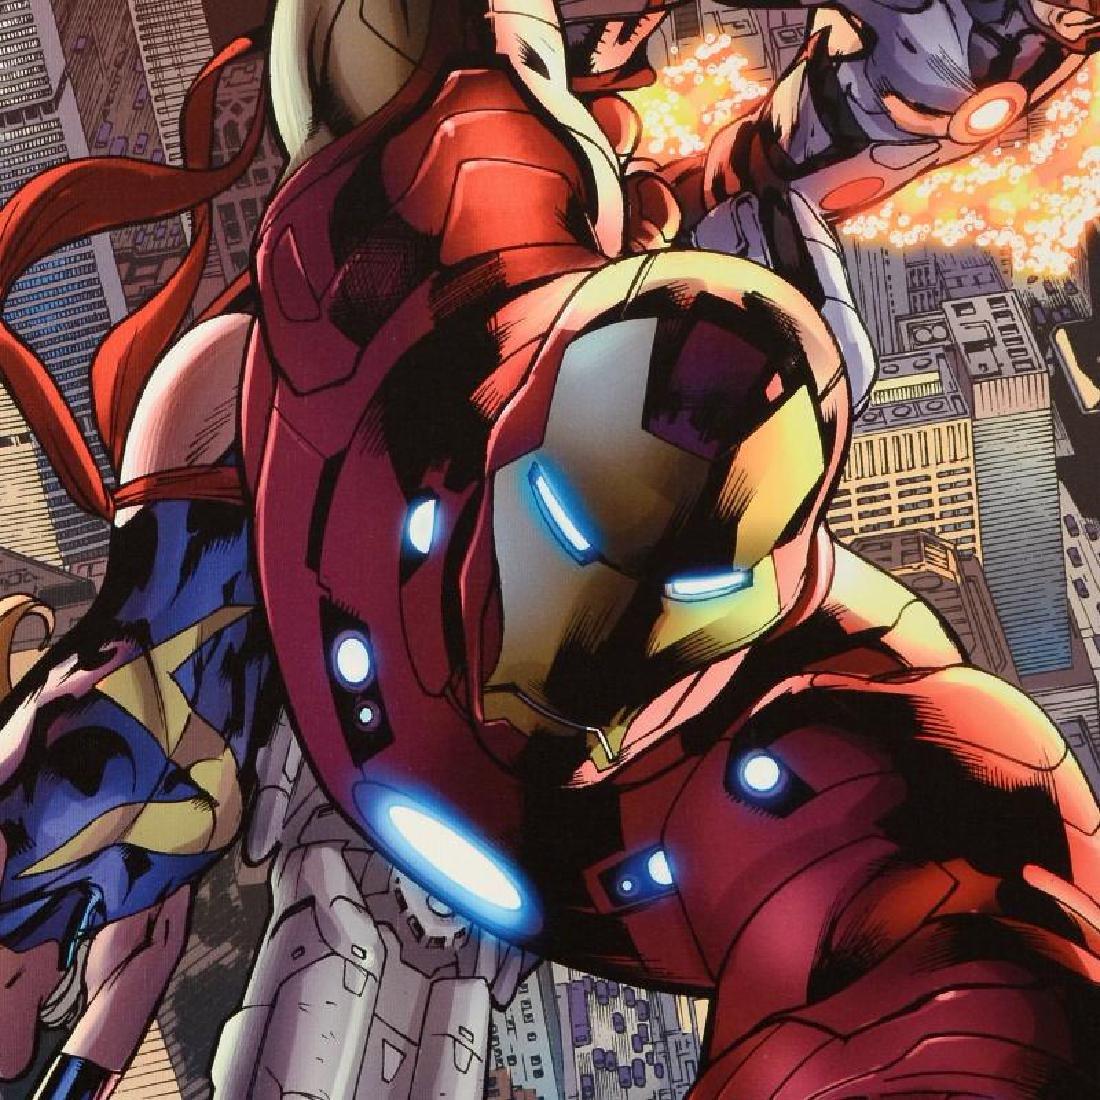 Avengers #12.1 by Stan Lee - Marvel Comics - 2